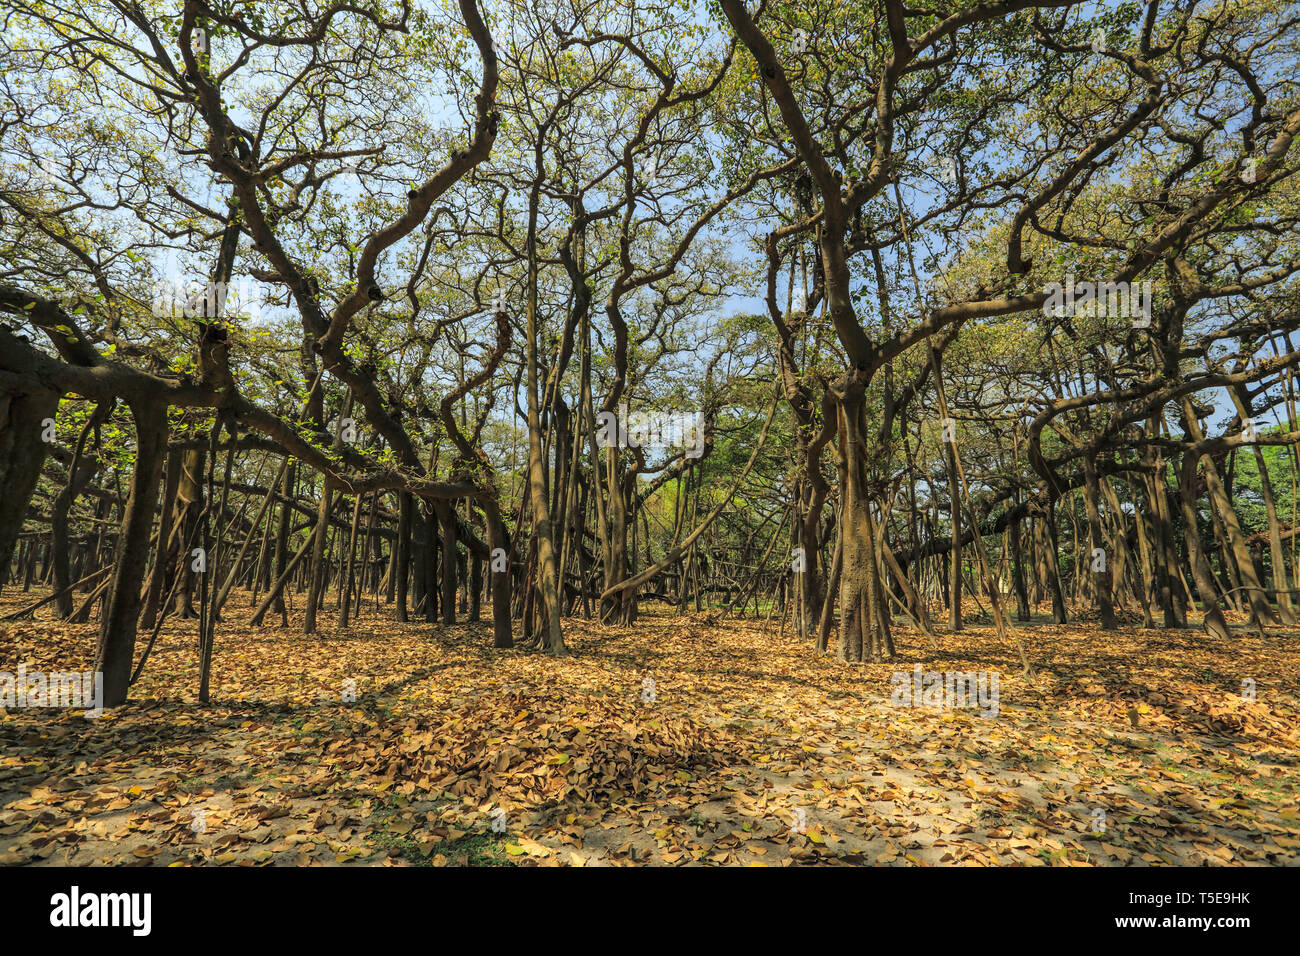 banyan tree, Acharya Jagadish Chandra Bose, Botanic Garden, West Bengal, India, Asia - Stock Image